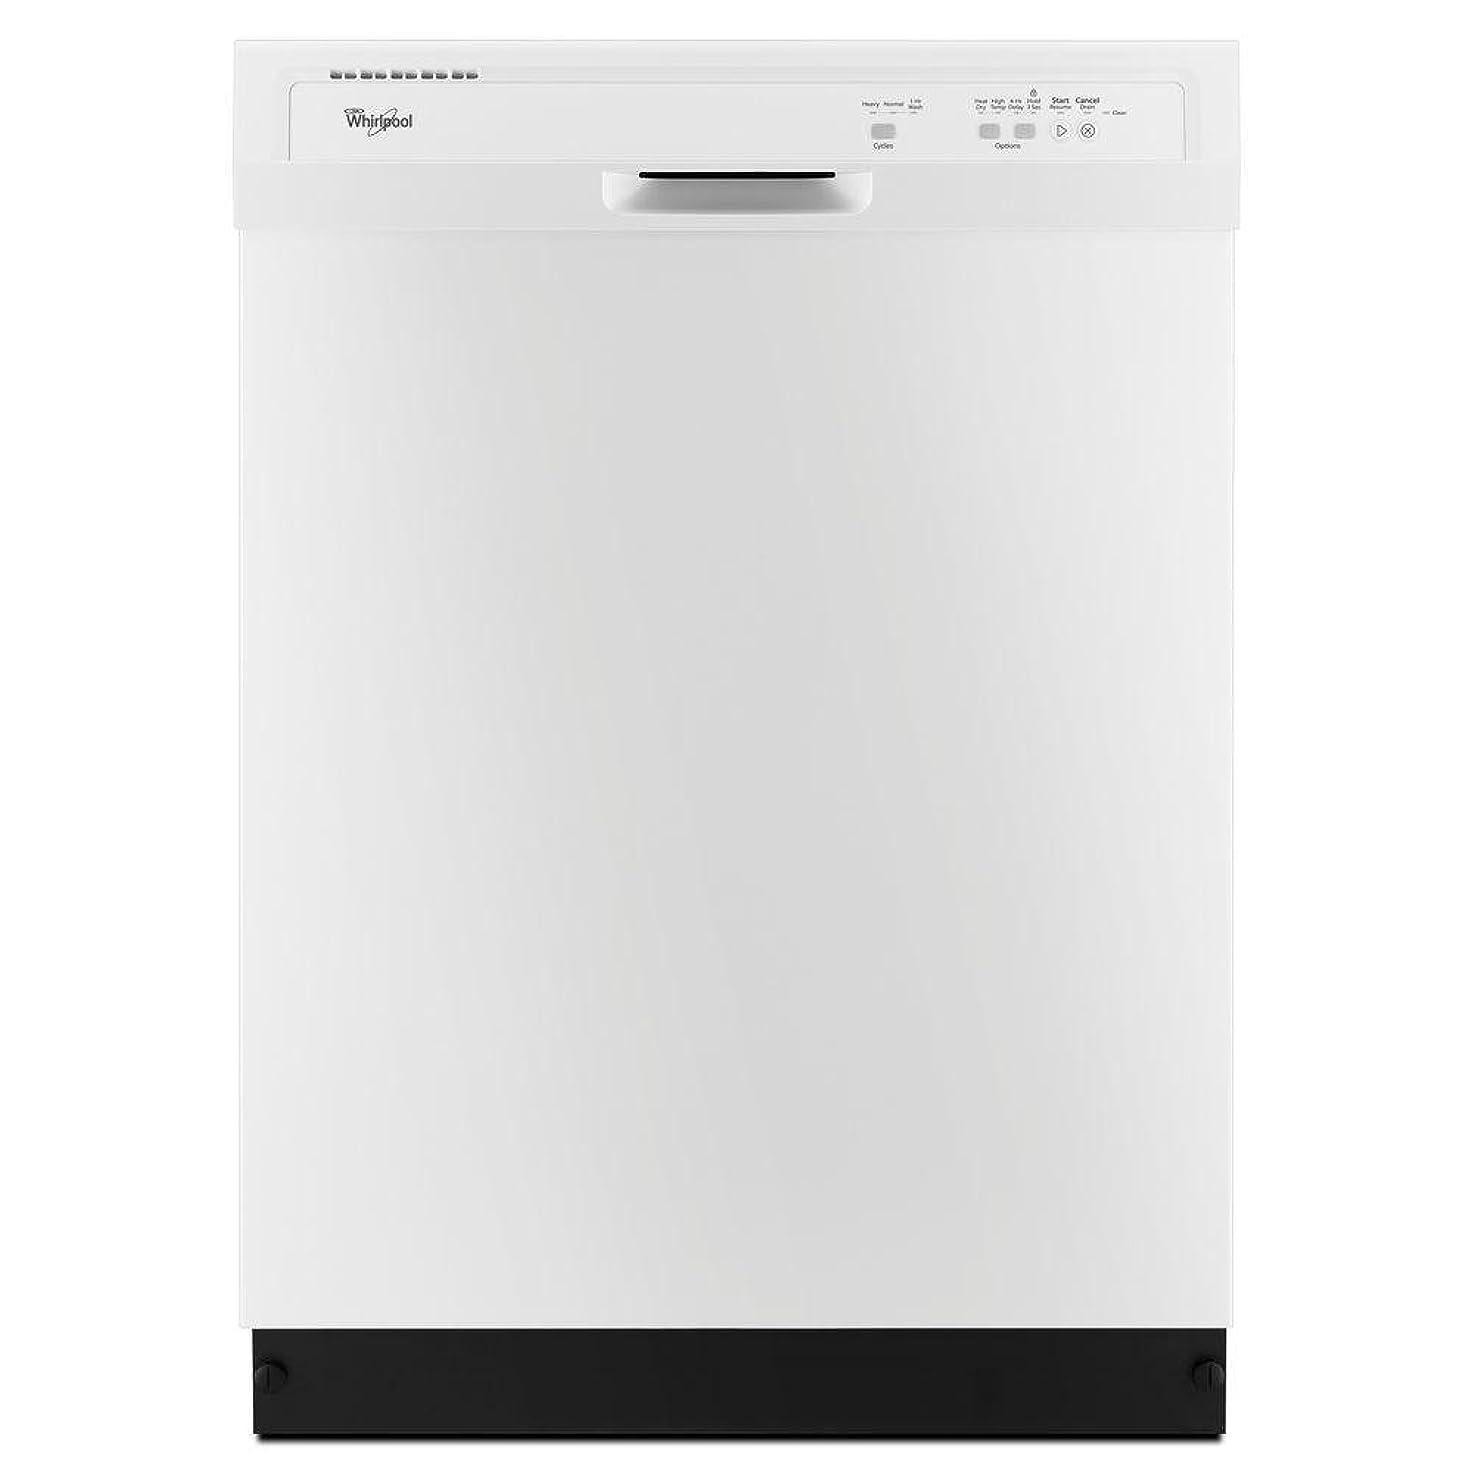 Dishwasher Whirlpool 23.88